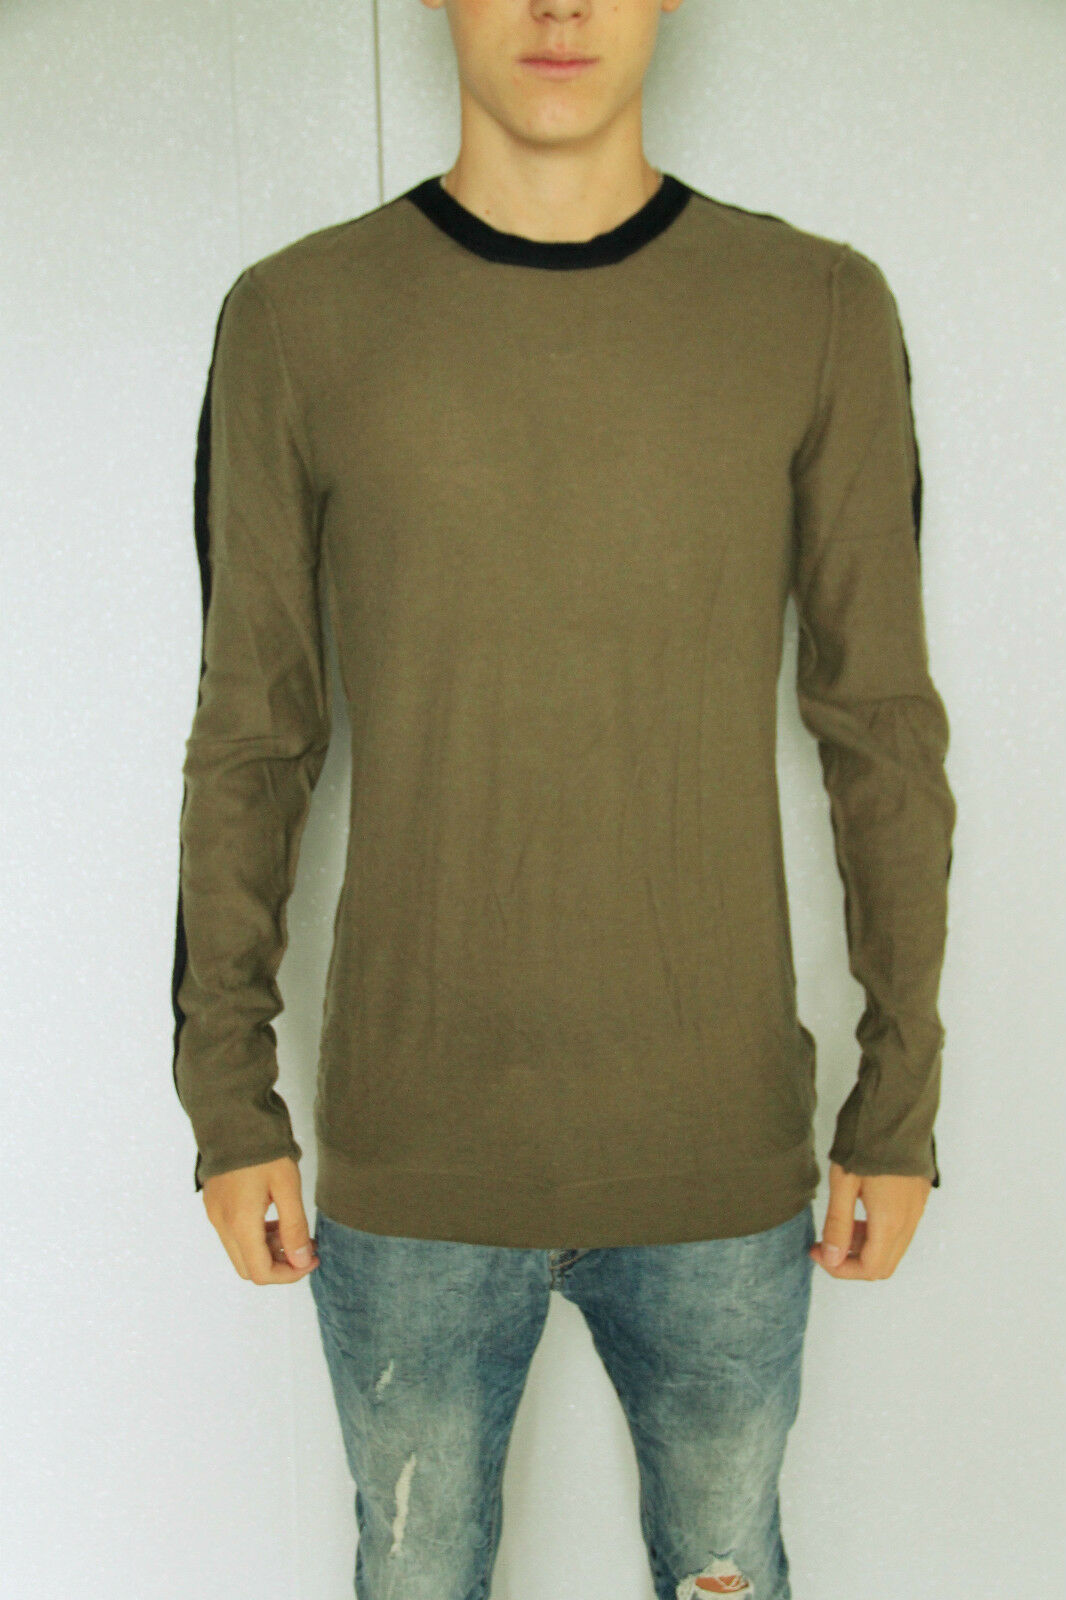 Sweater khaki angora merino extra fine m+ F GIRBAUD T L NEW/LABEL val